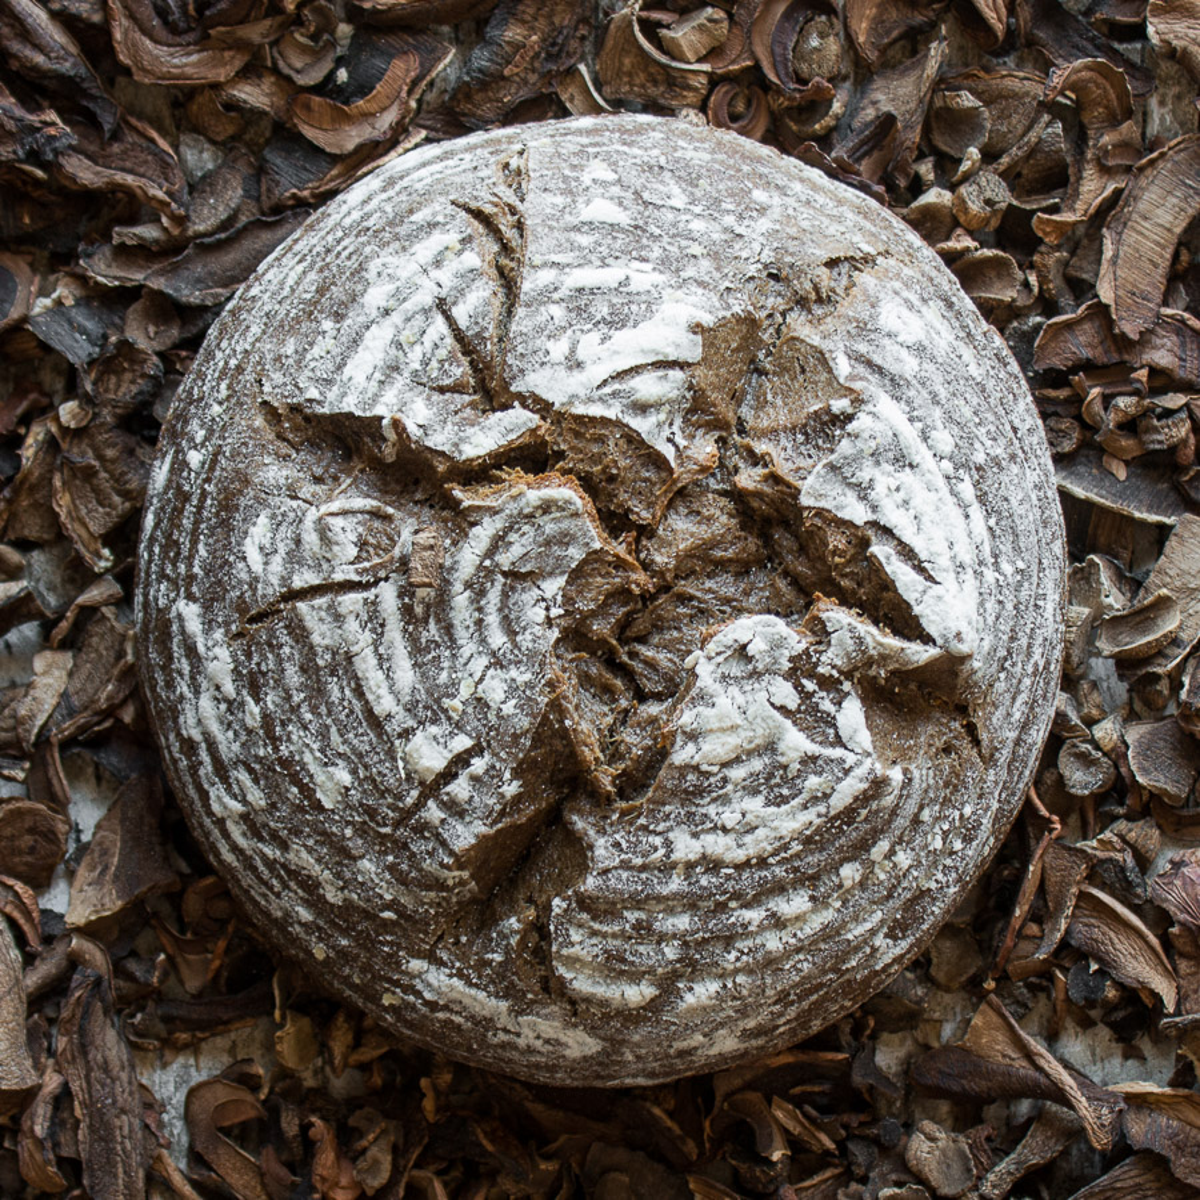 Naturally Leavened Wild Mushroom Sourdough